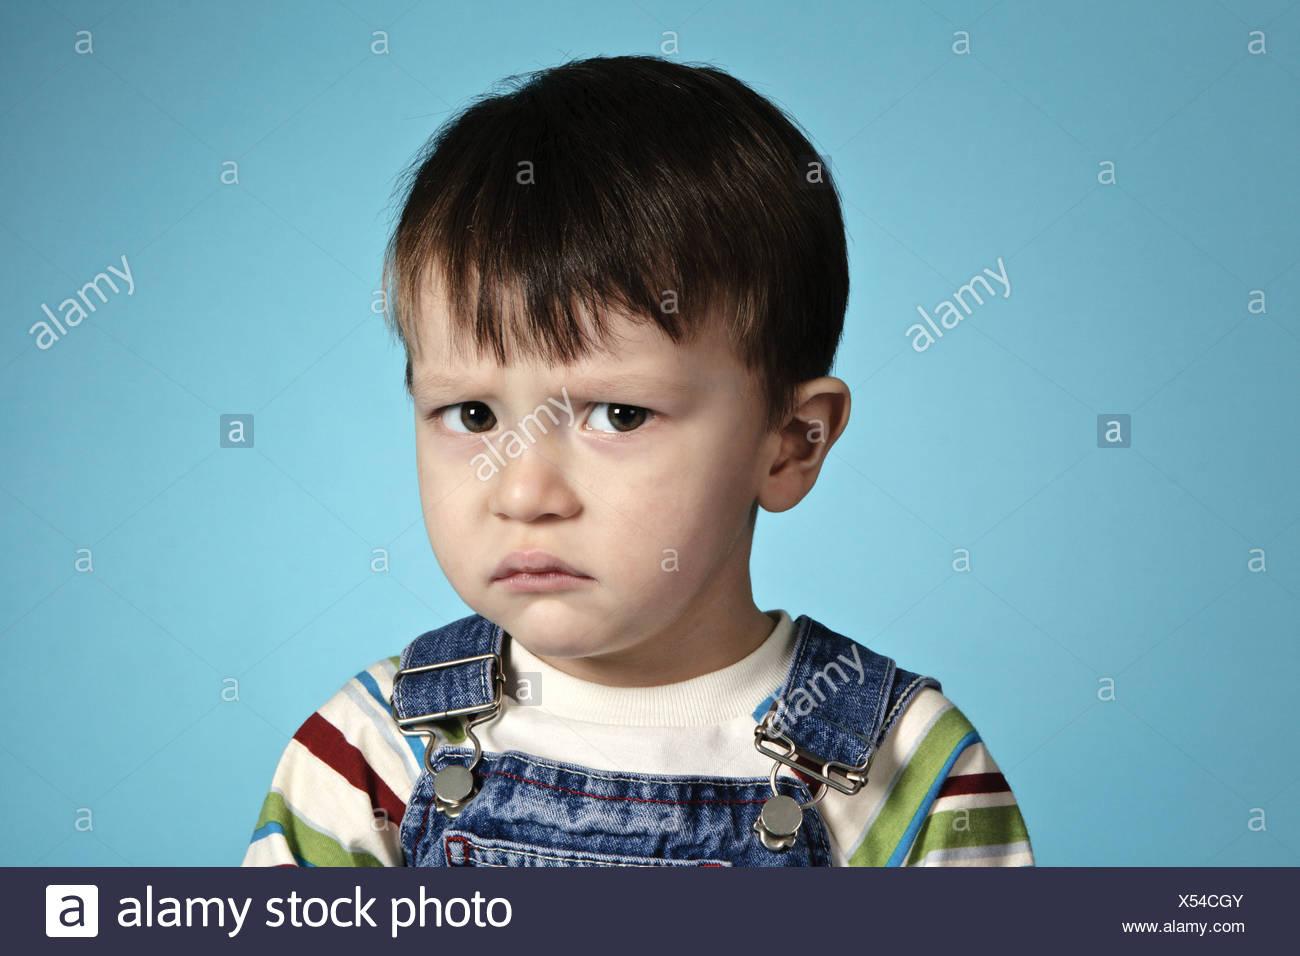 Stress boy with sad sight - Stock Image